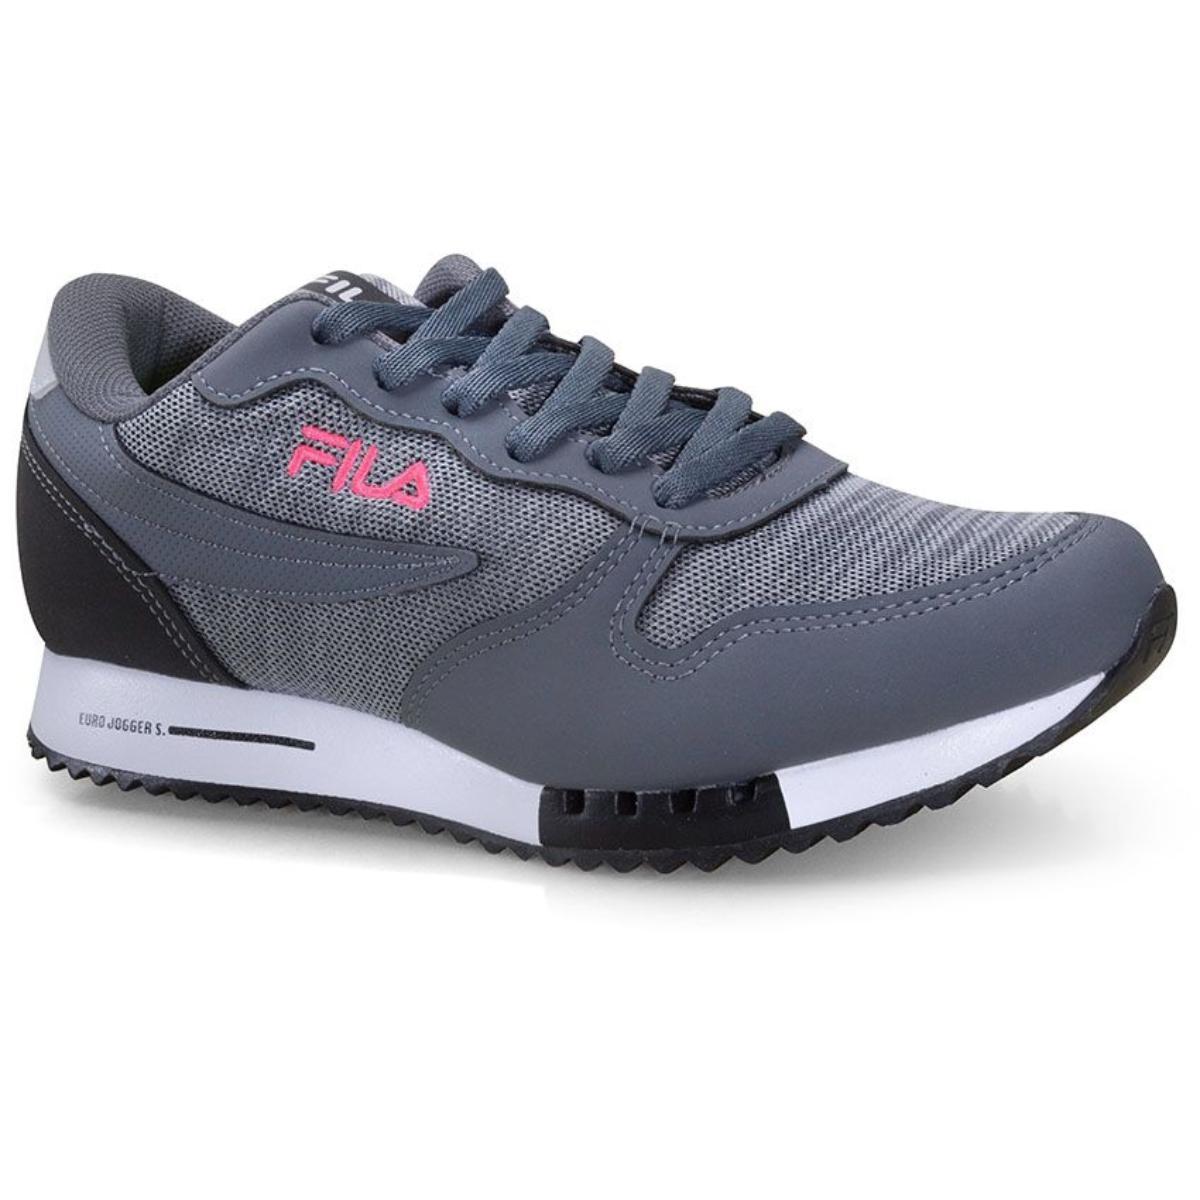 Tênis Feminino Fila 51u335x.3207 Euro Jogger Sport Grafite/prata/rosa